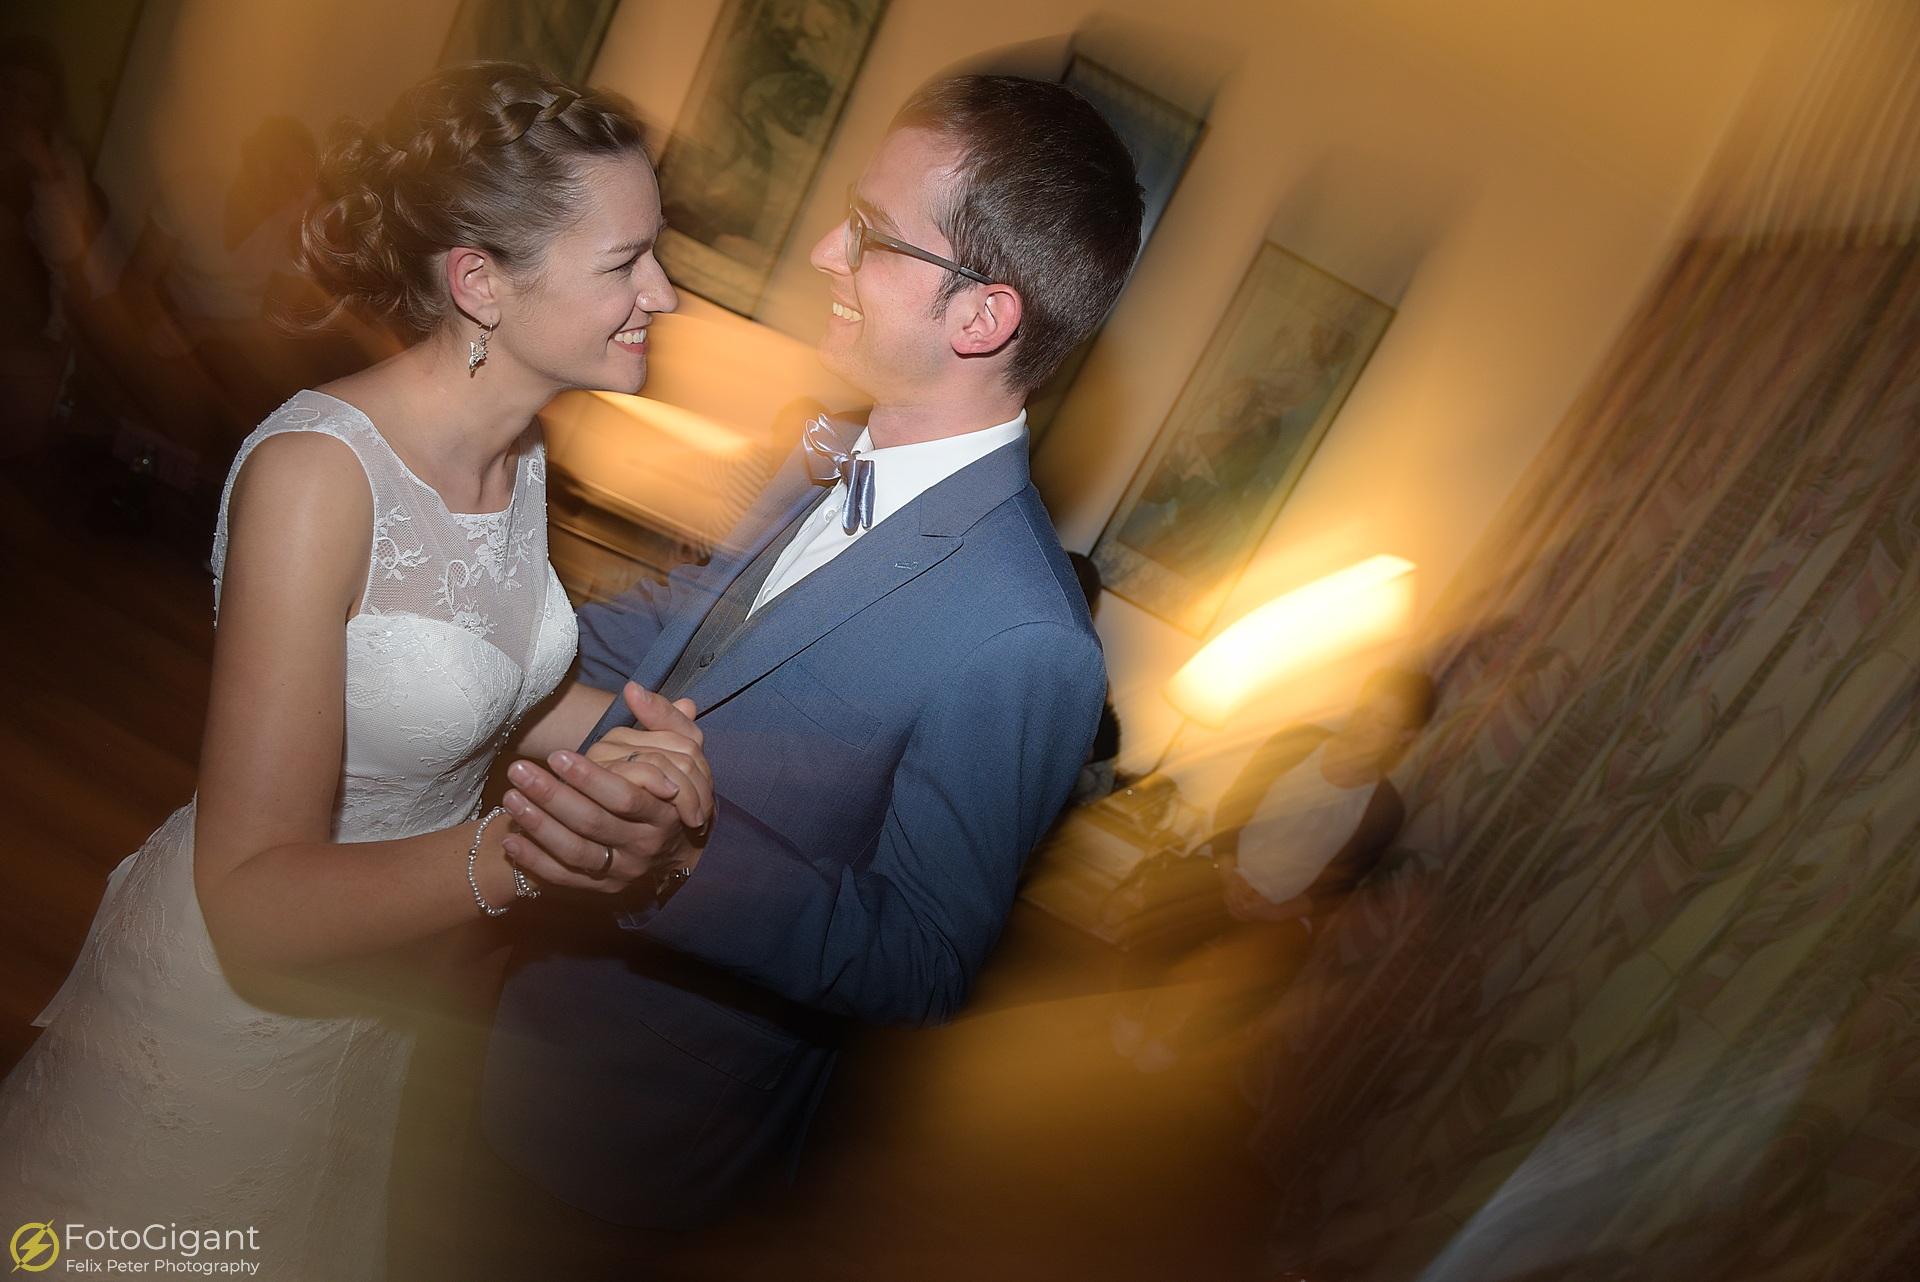 Hochzeitsfotografiekurs_Fotograf_Felix_Peter_34.jpg